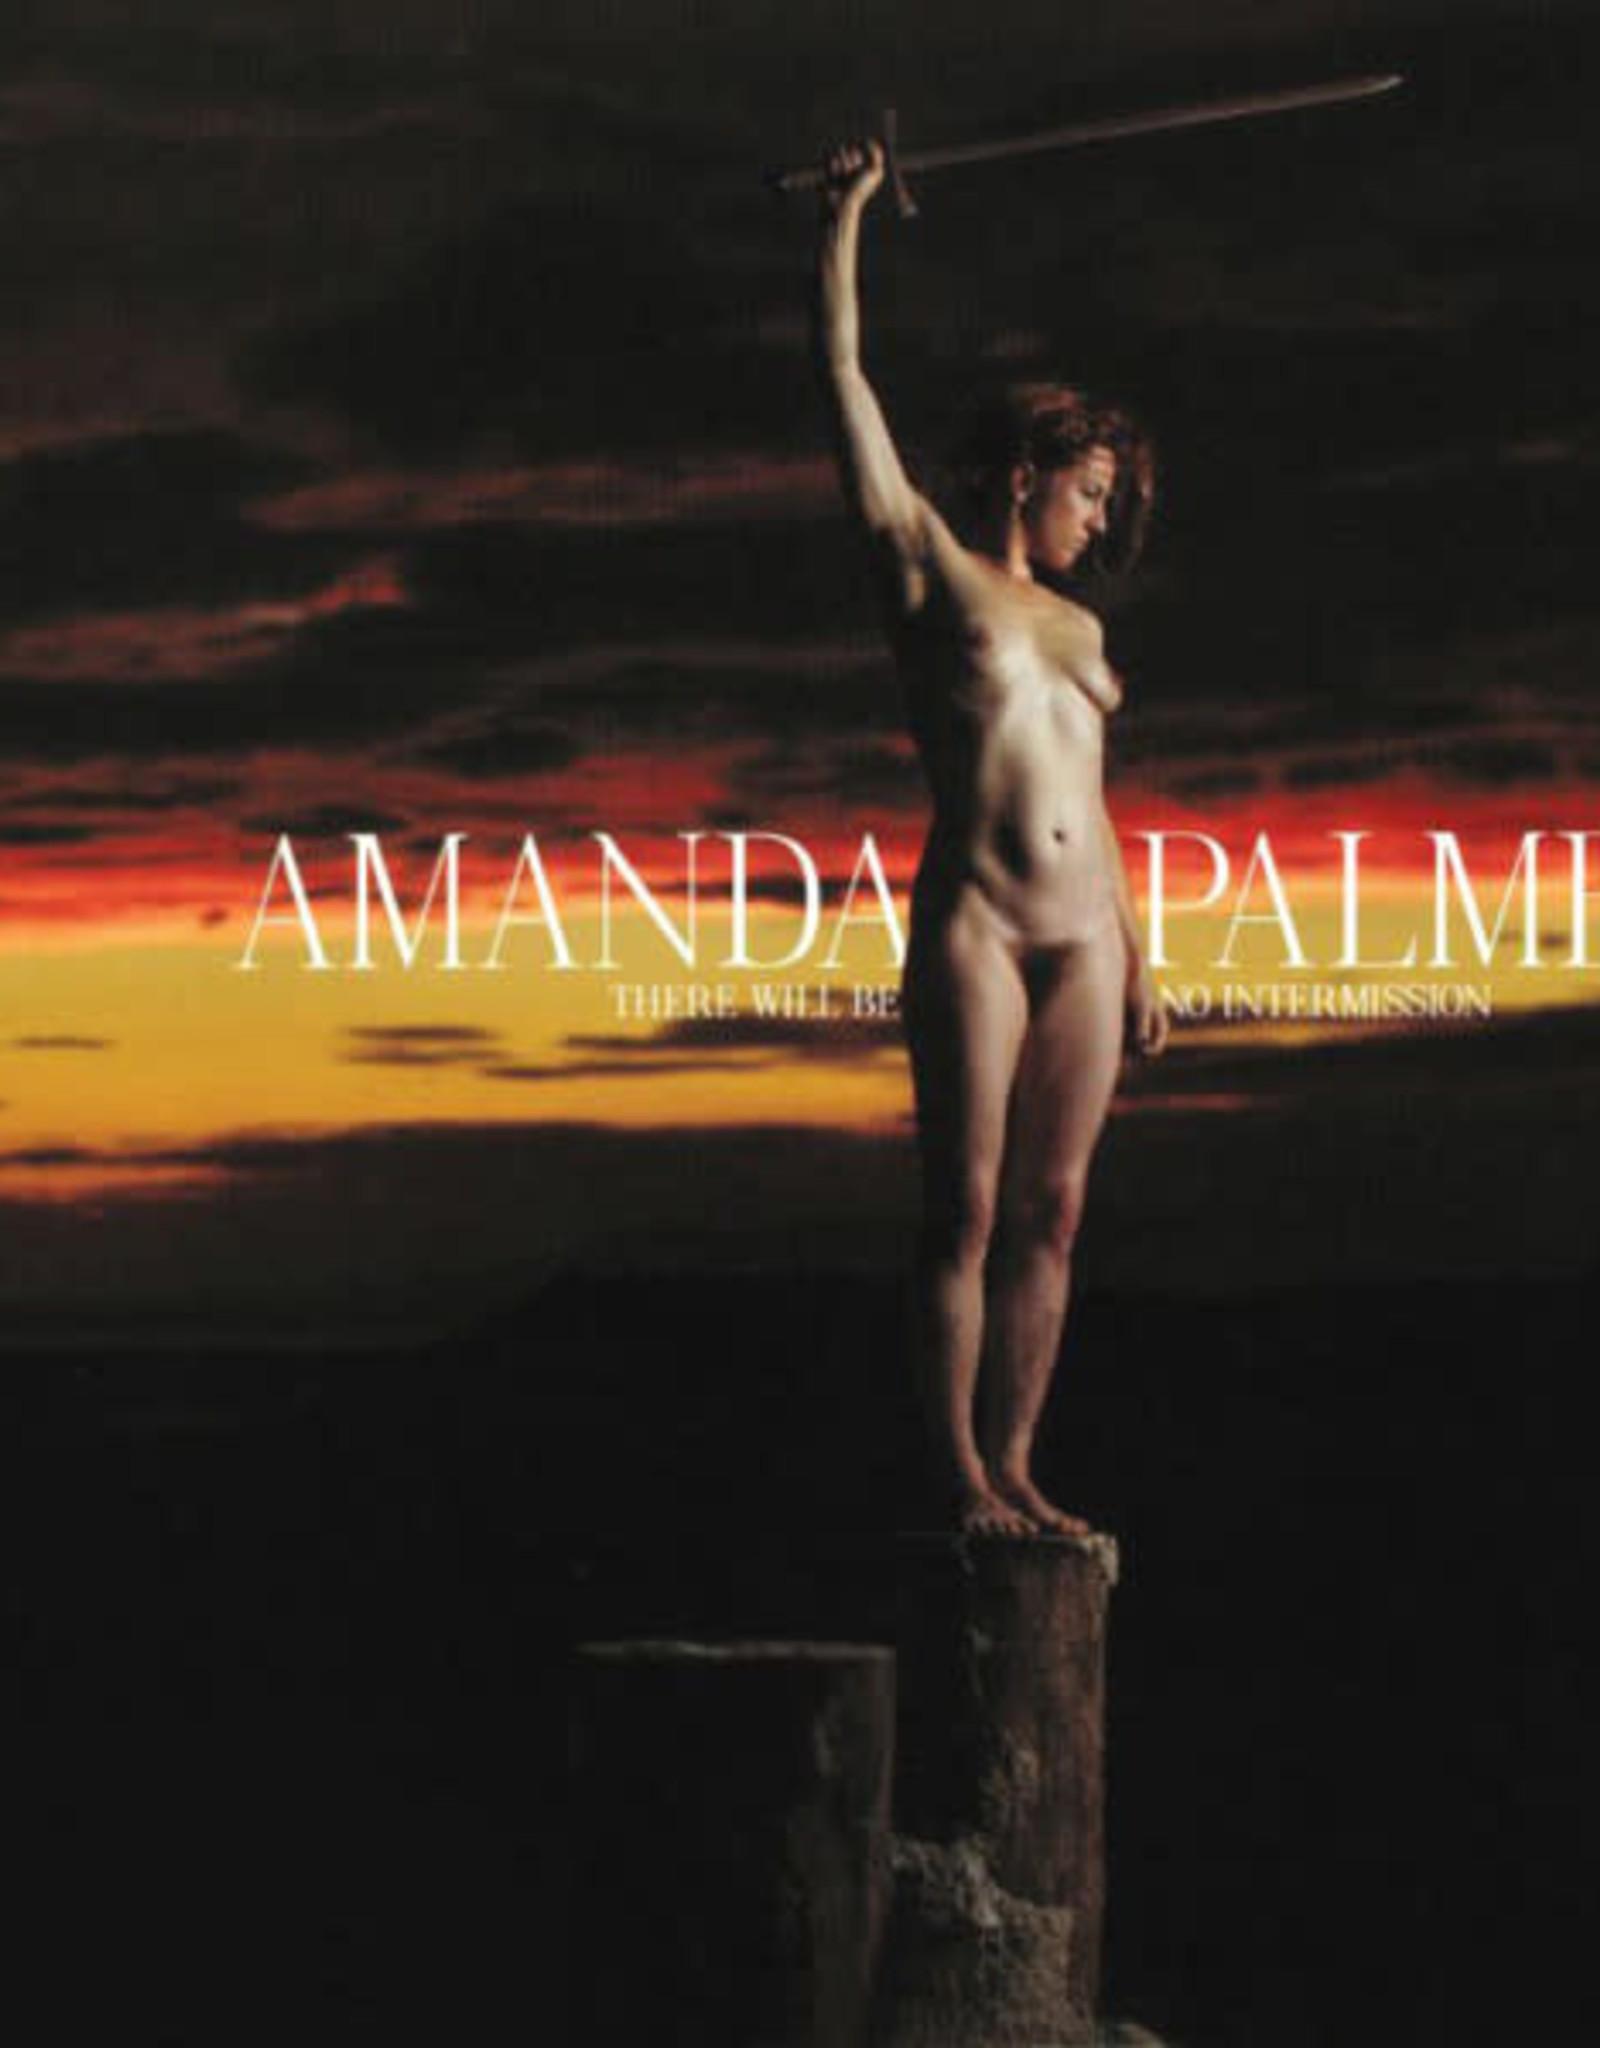 Amanda Palmer - There Will Be No Intermission